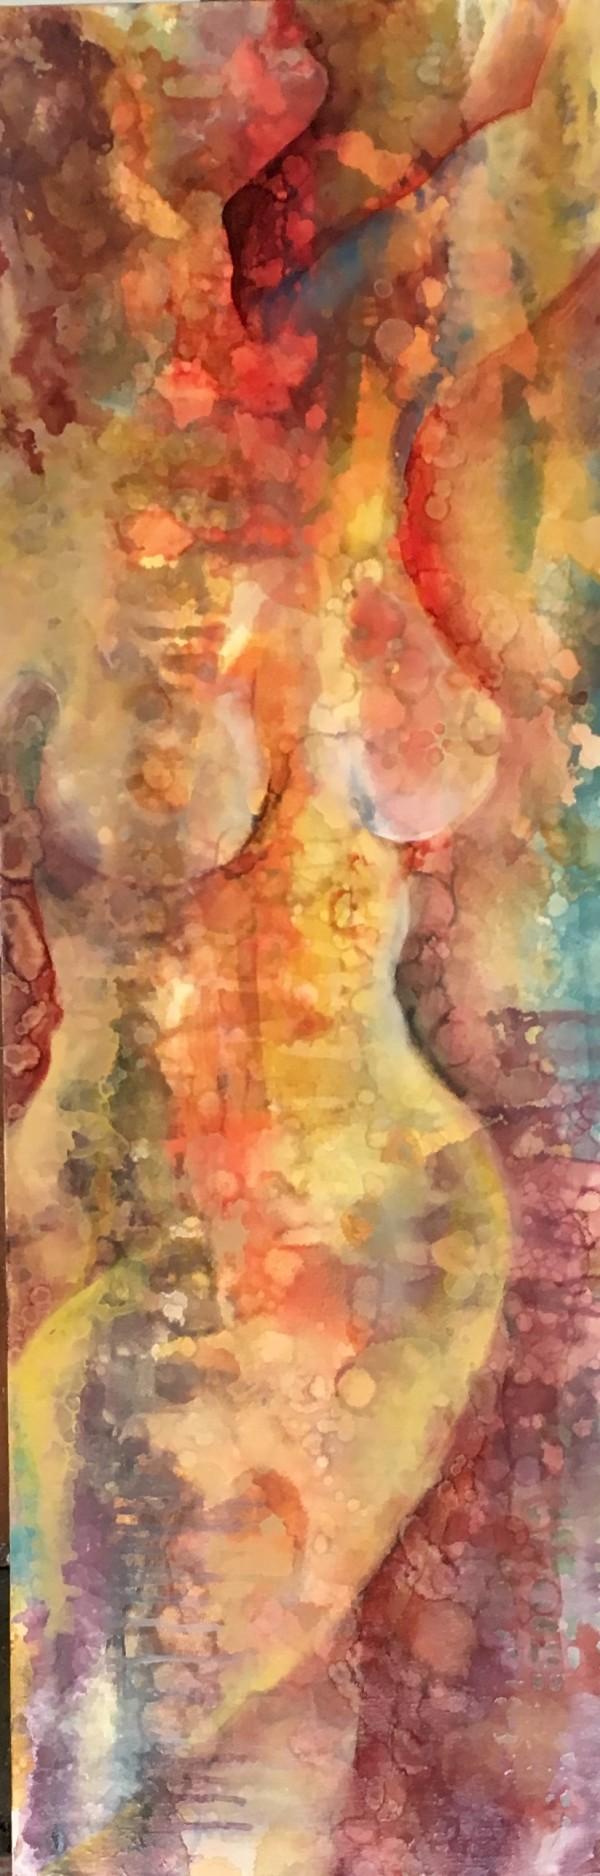 Lolita by Ansley Pye